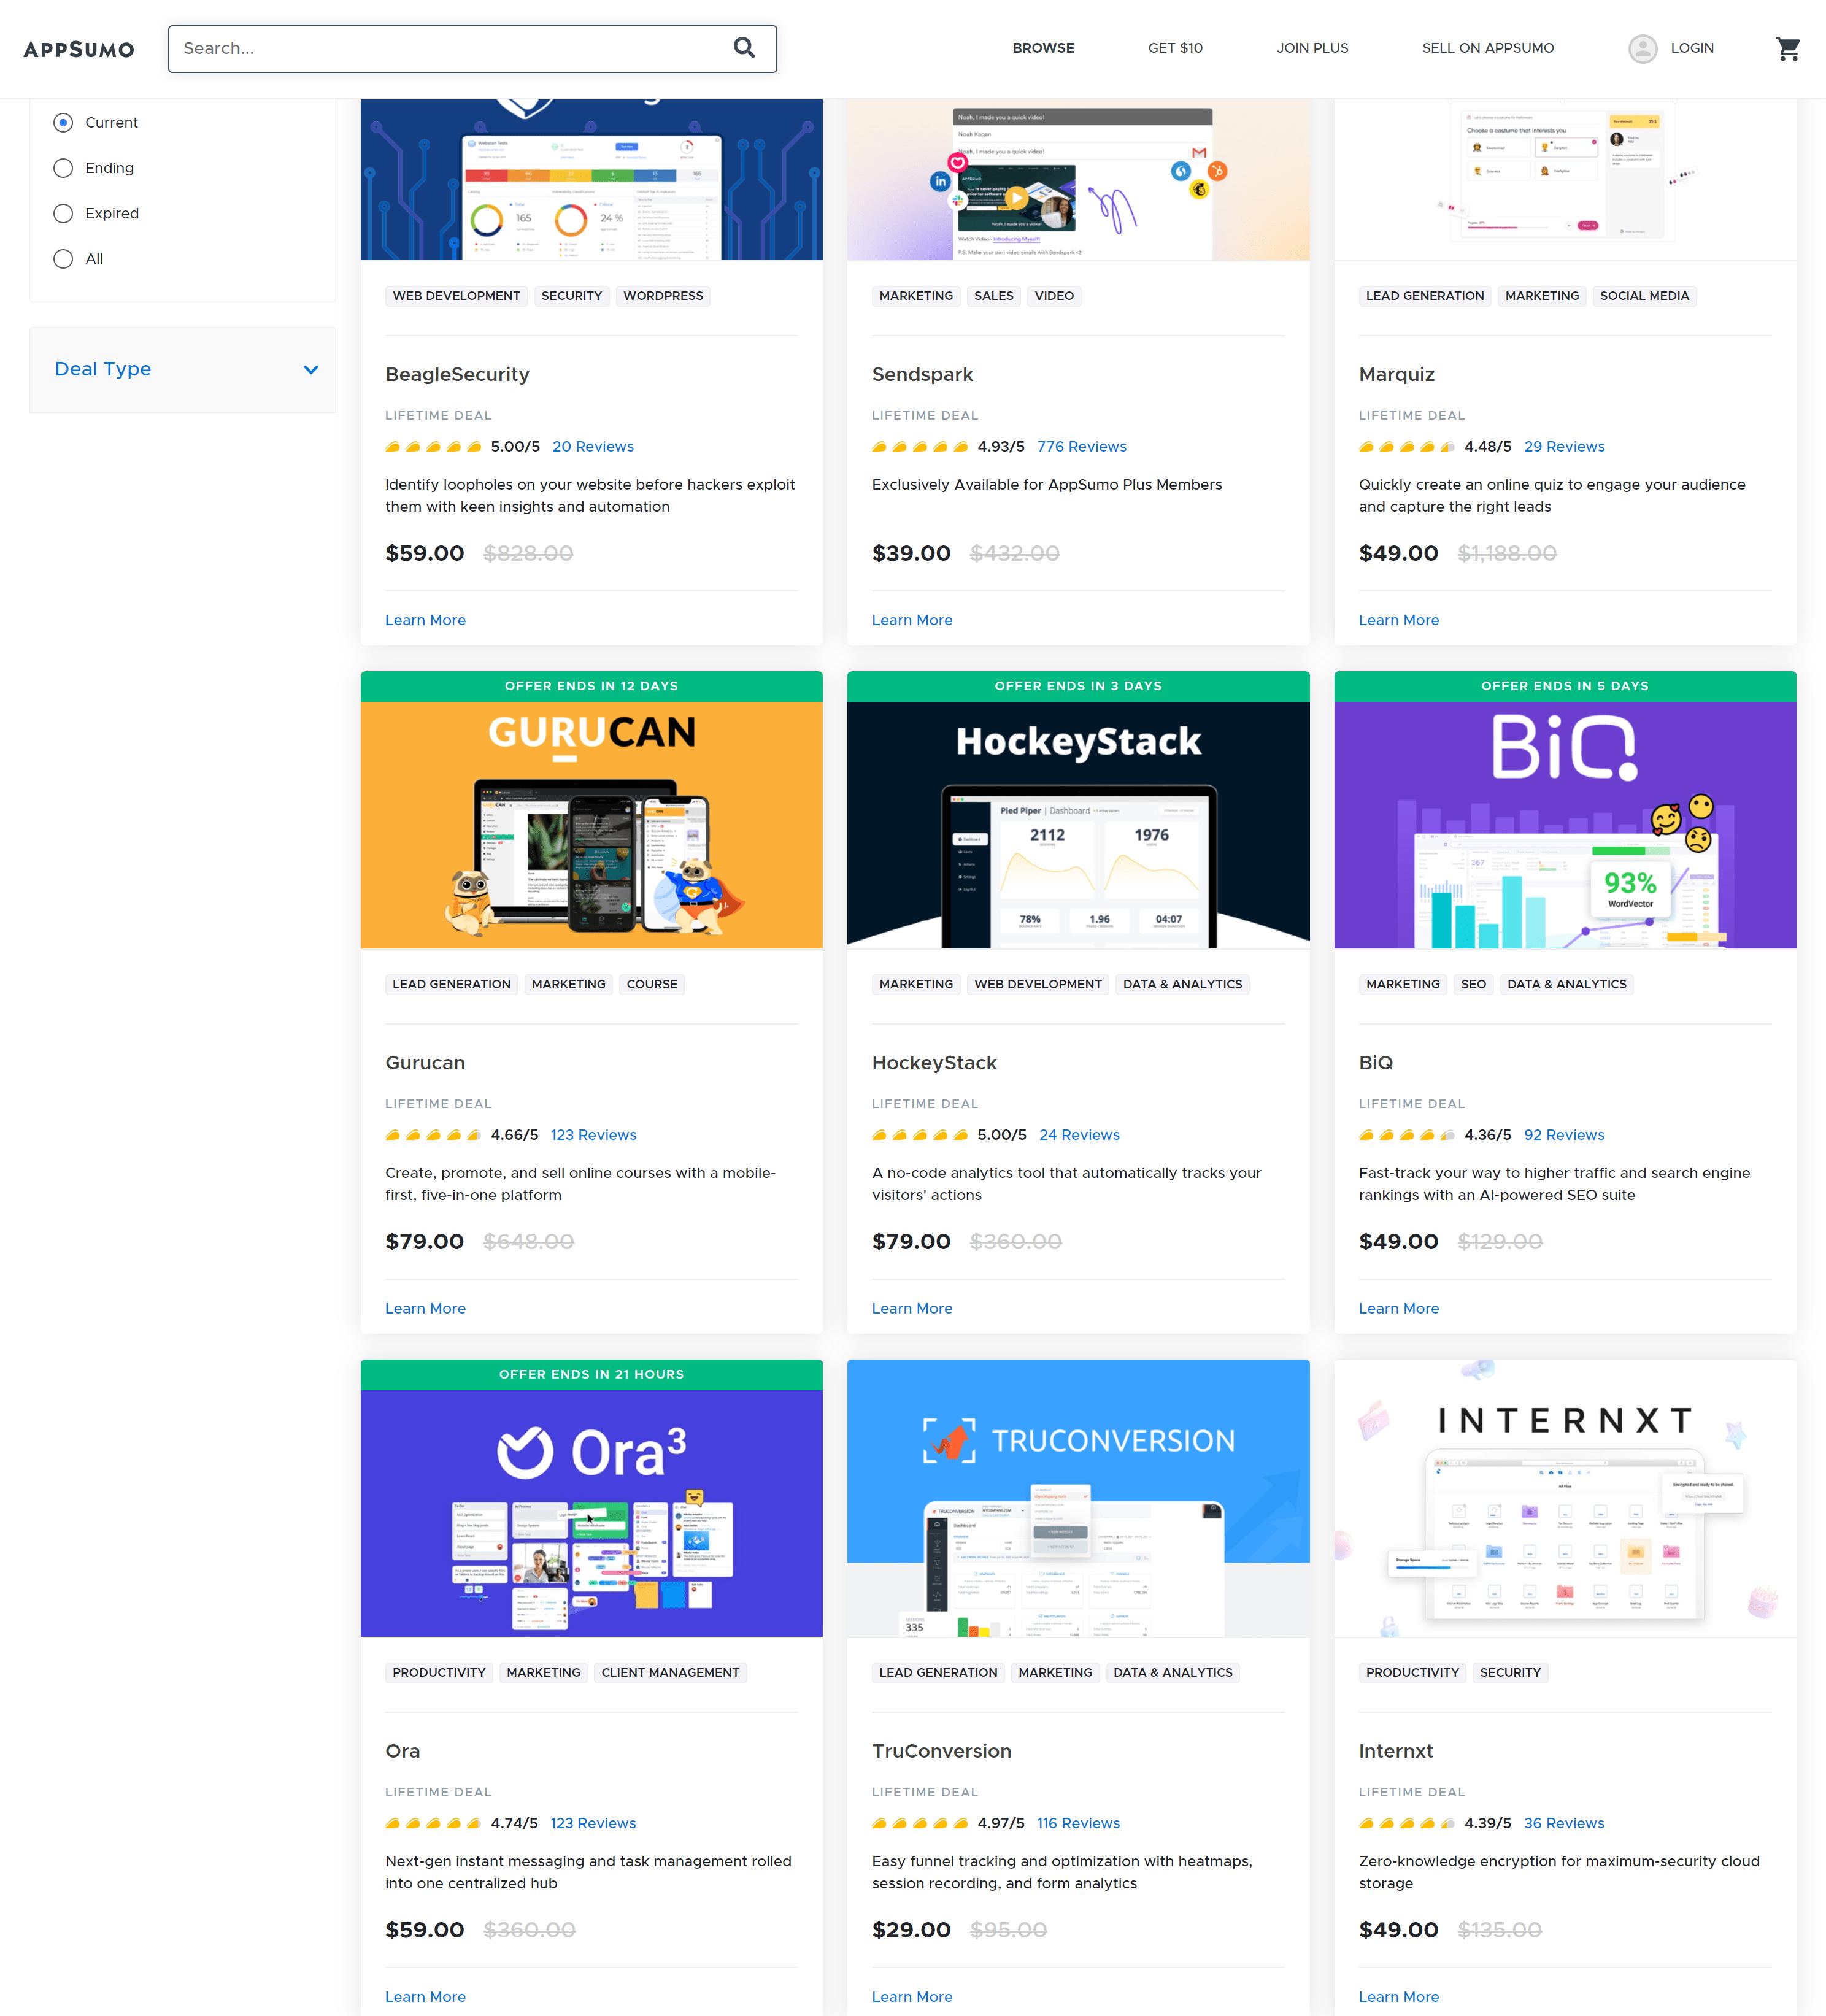 Upcoming Appsumo deals- Appsumo coupon codes